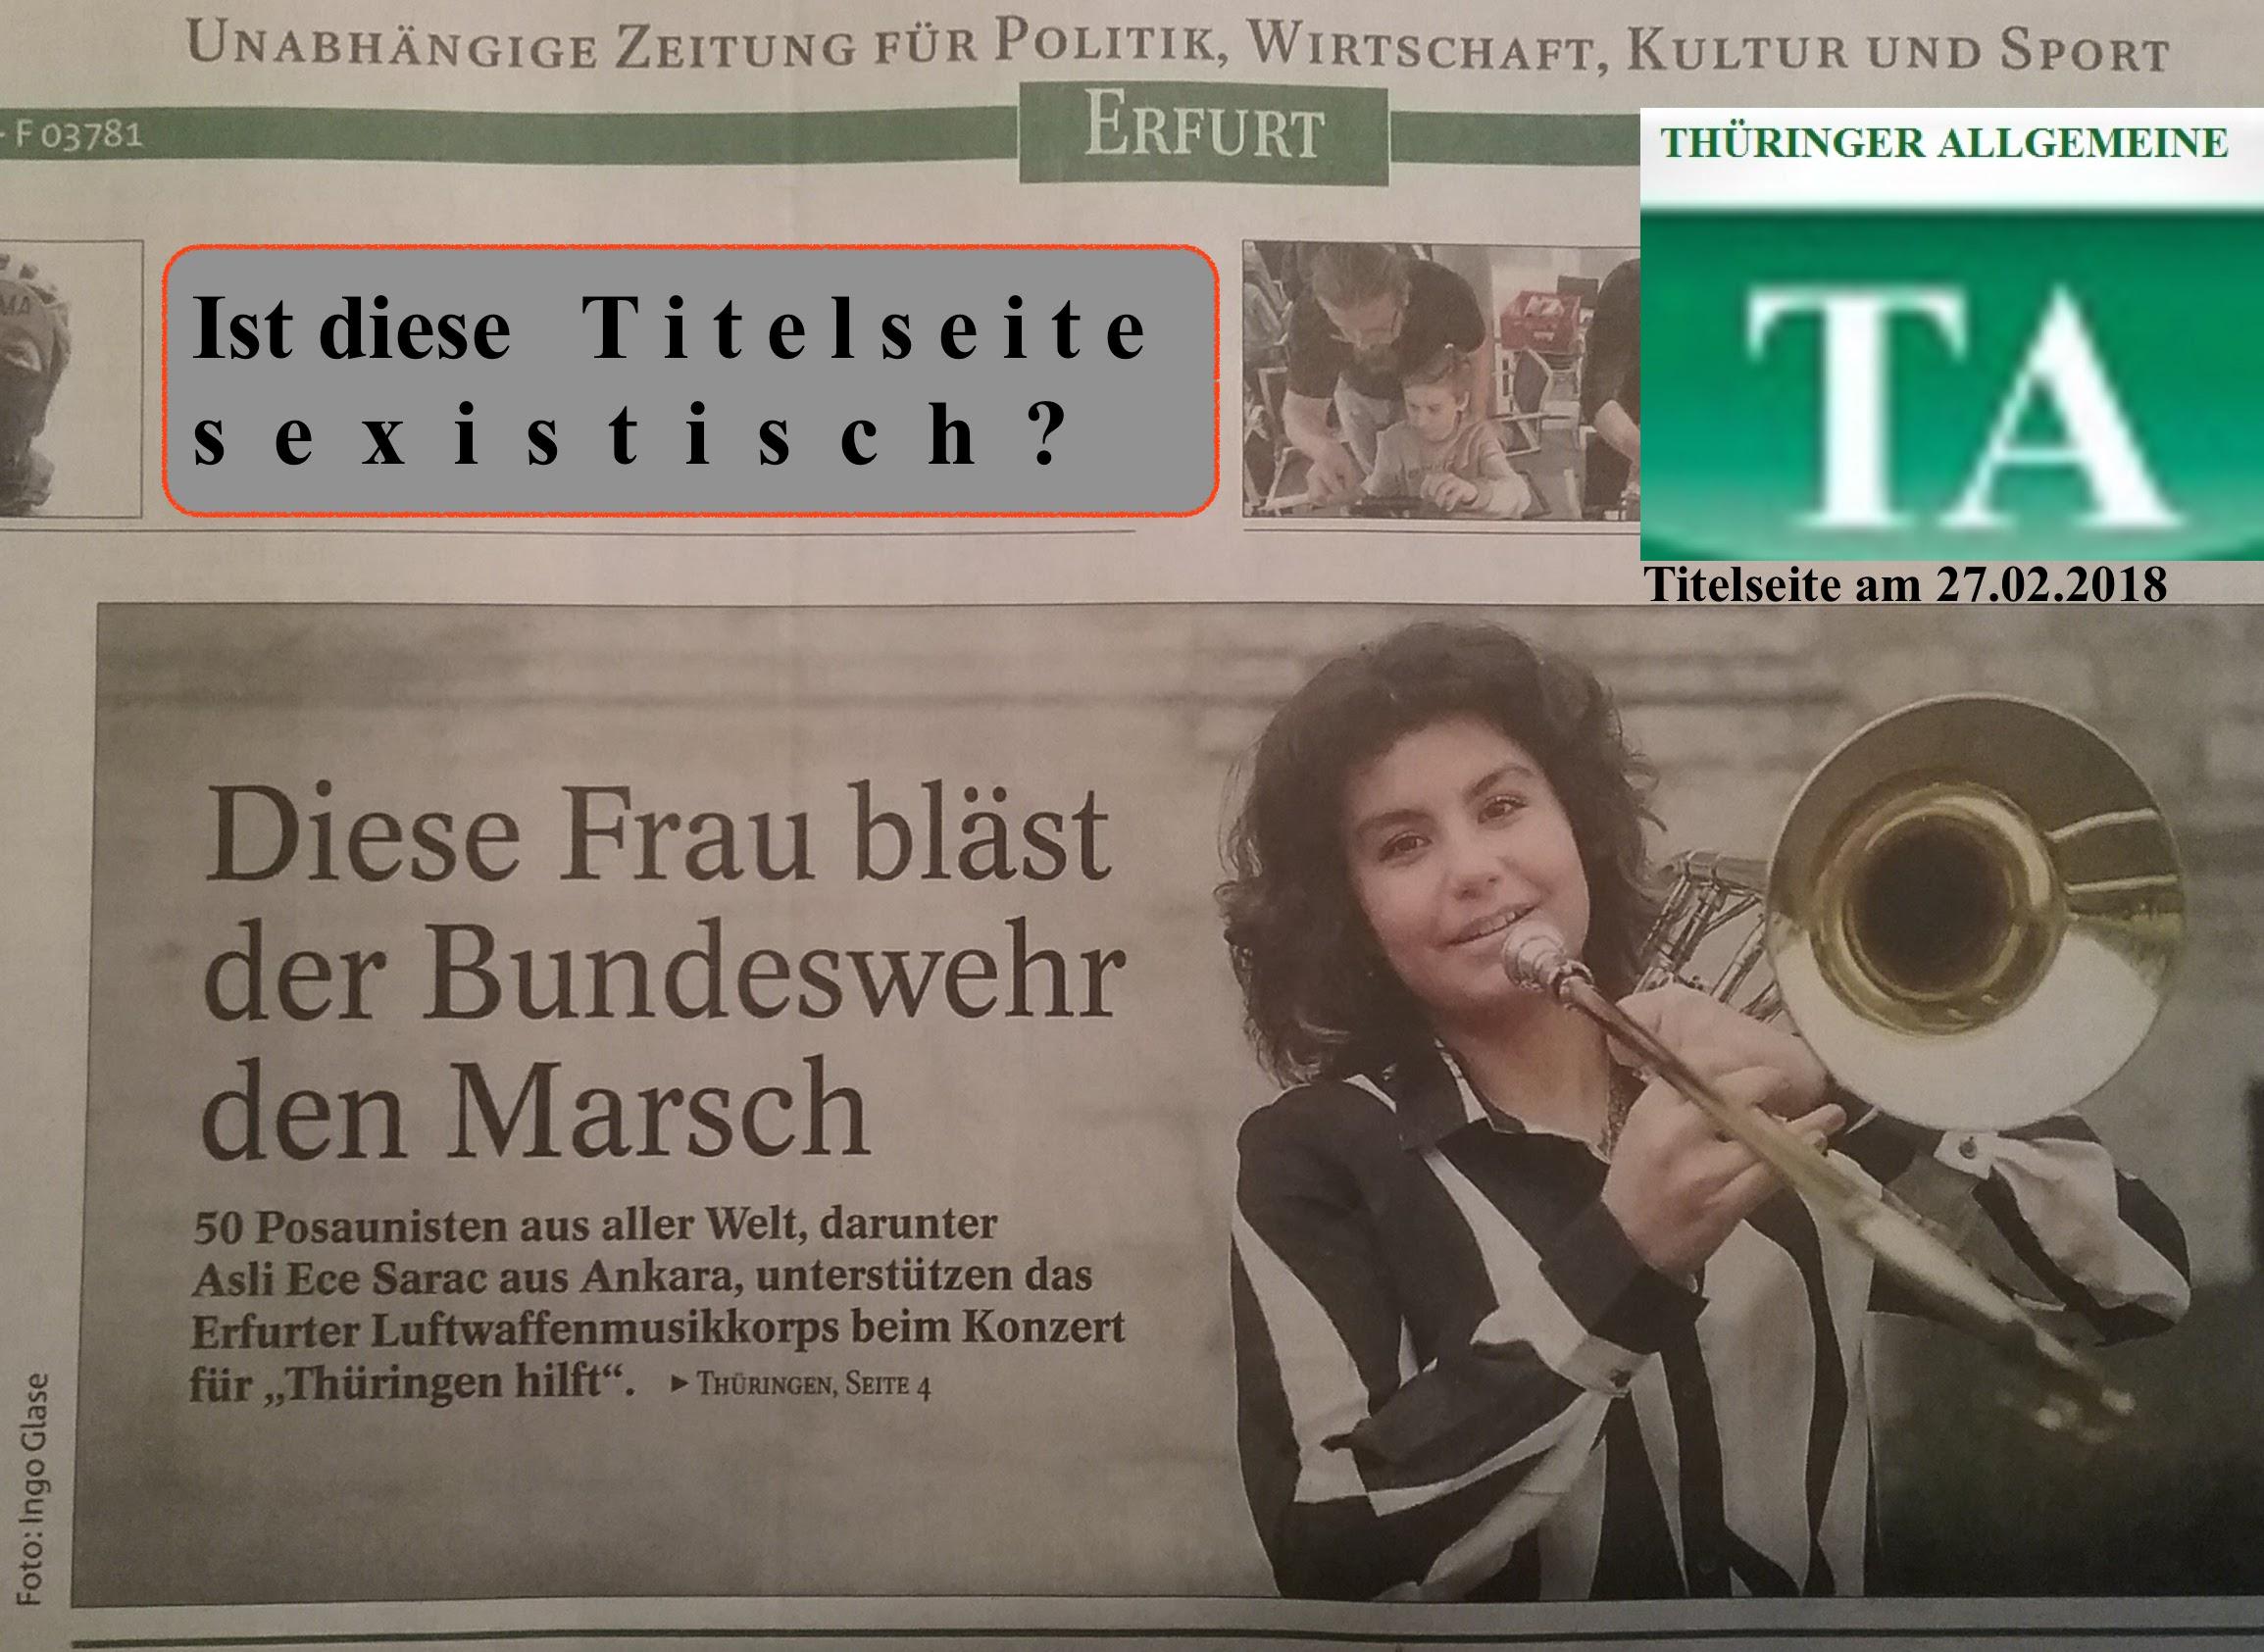 ThürAllgem_TA_2018.02.27 sexistisch